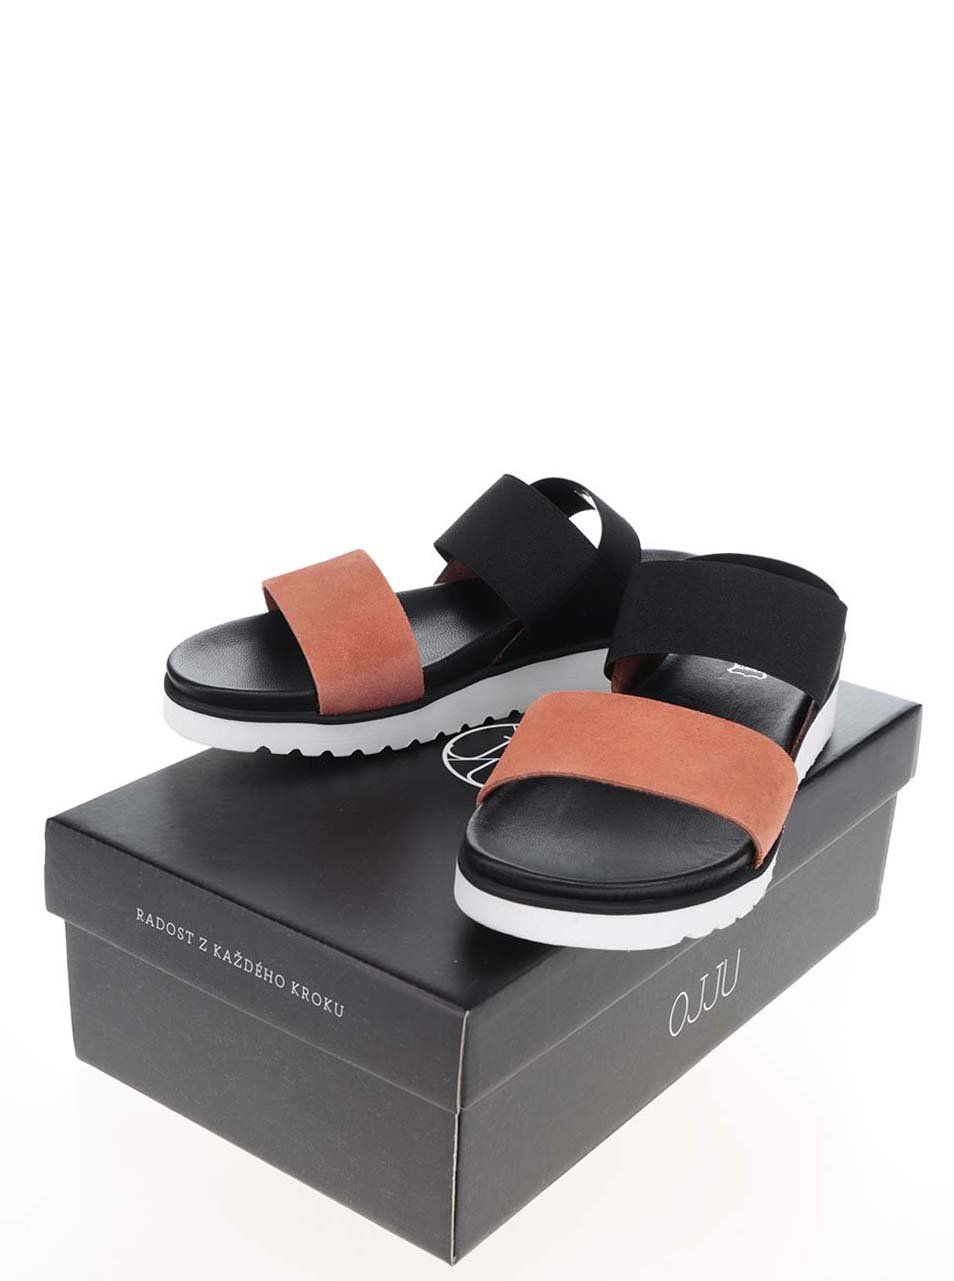 8fbec7edefdd Oranžovo-čierne dámske sandále OJJU ...